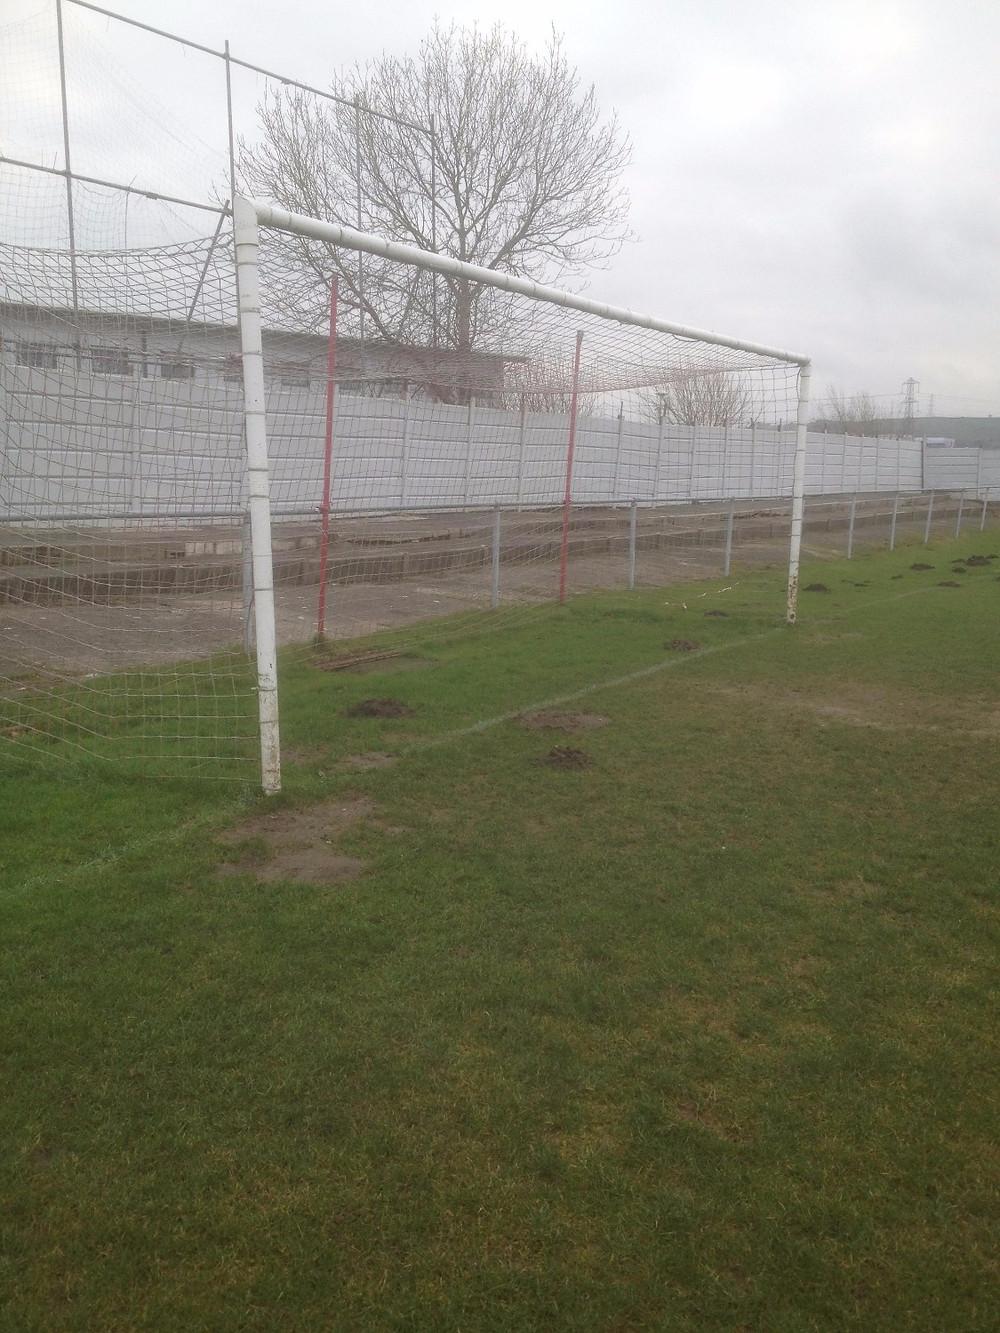 Mole in a goal in Lancashire